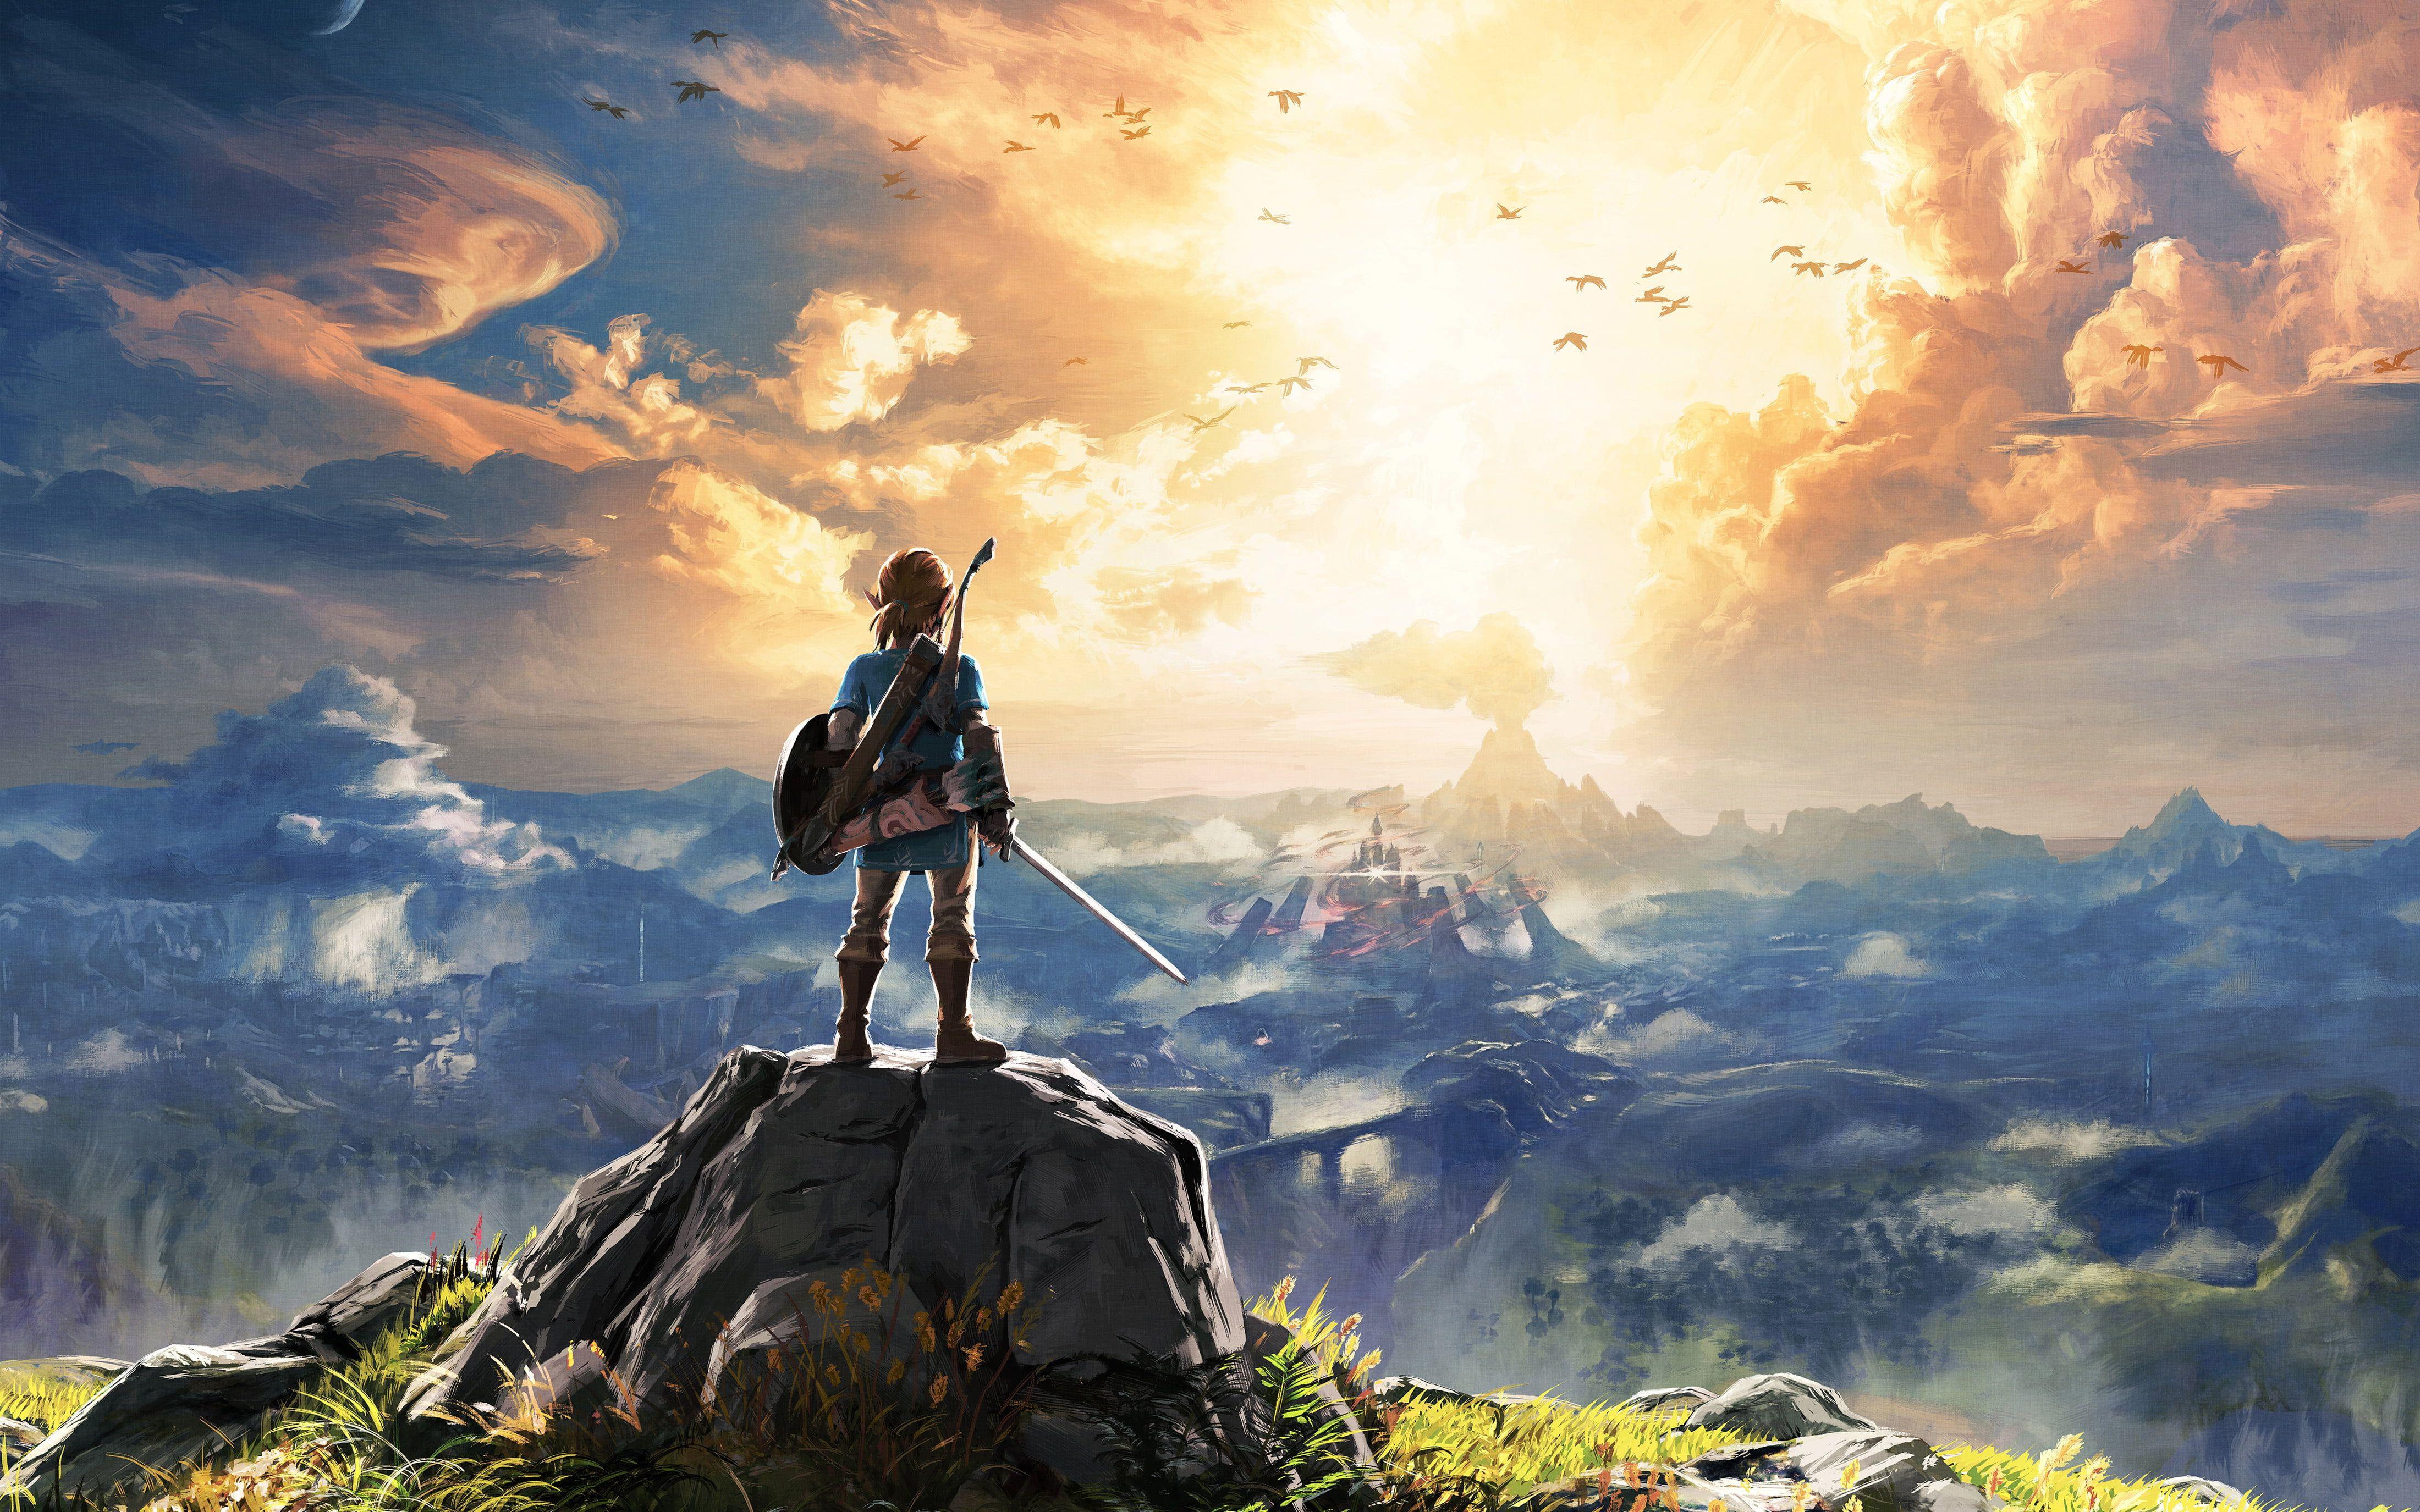 Game Character Wallpaper The Legend Of Zelda The Legend Of Zelda Breath Of The Wild Link Hyrule Castle B Breath Of The Wild Legend Of Zelda Video Game Genre